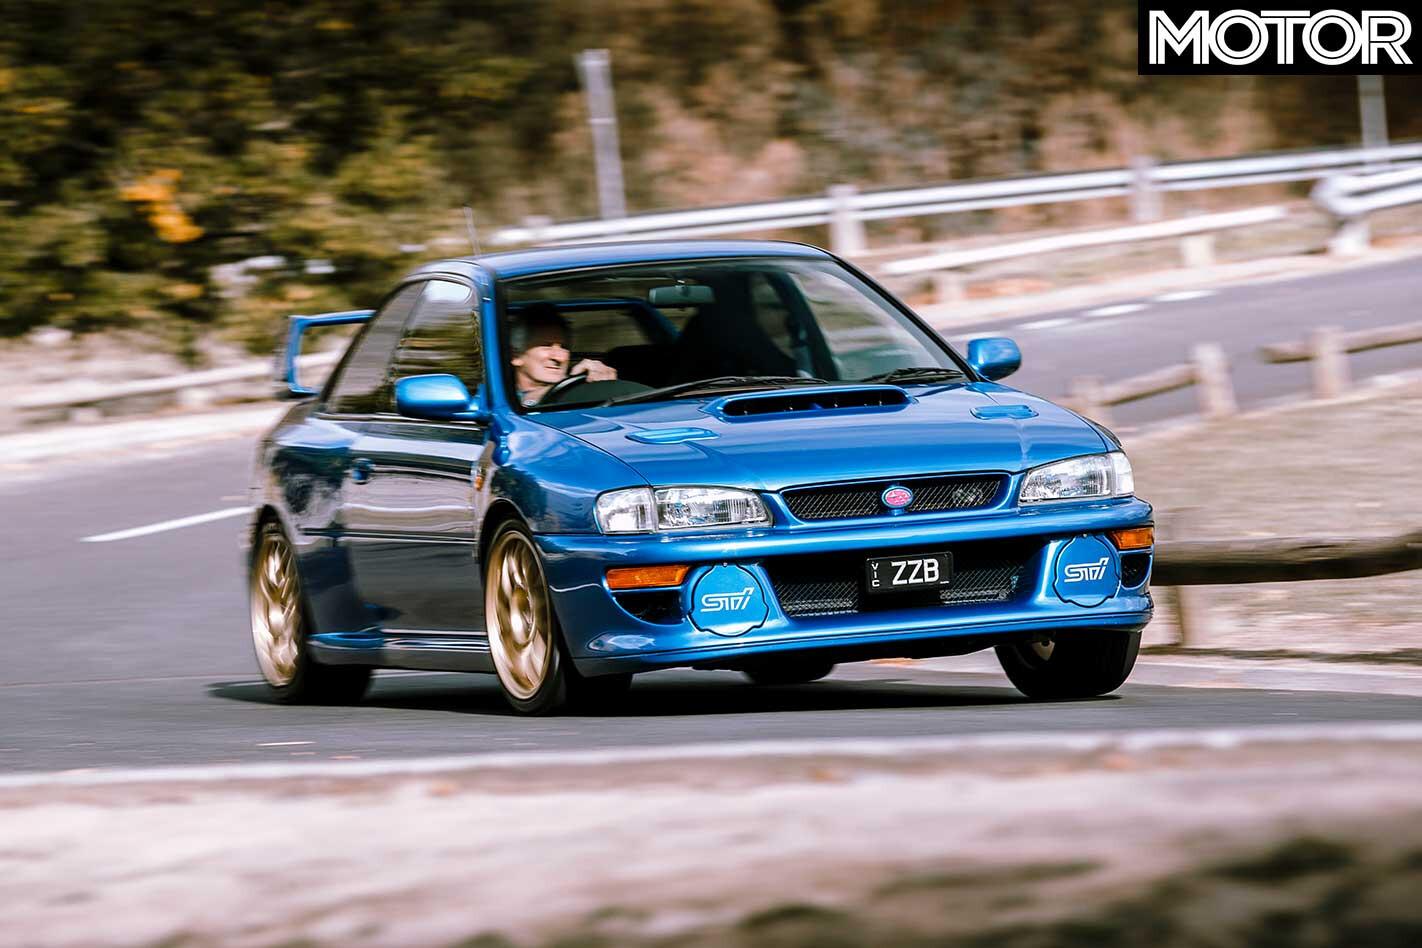 1998 Subaru Impreza WRX S Ti 22 B Handling Jpg